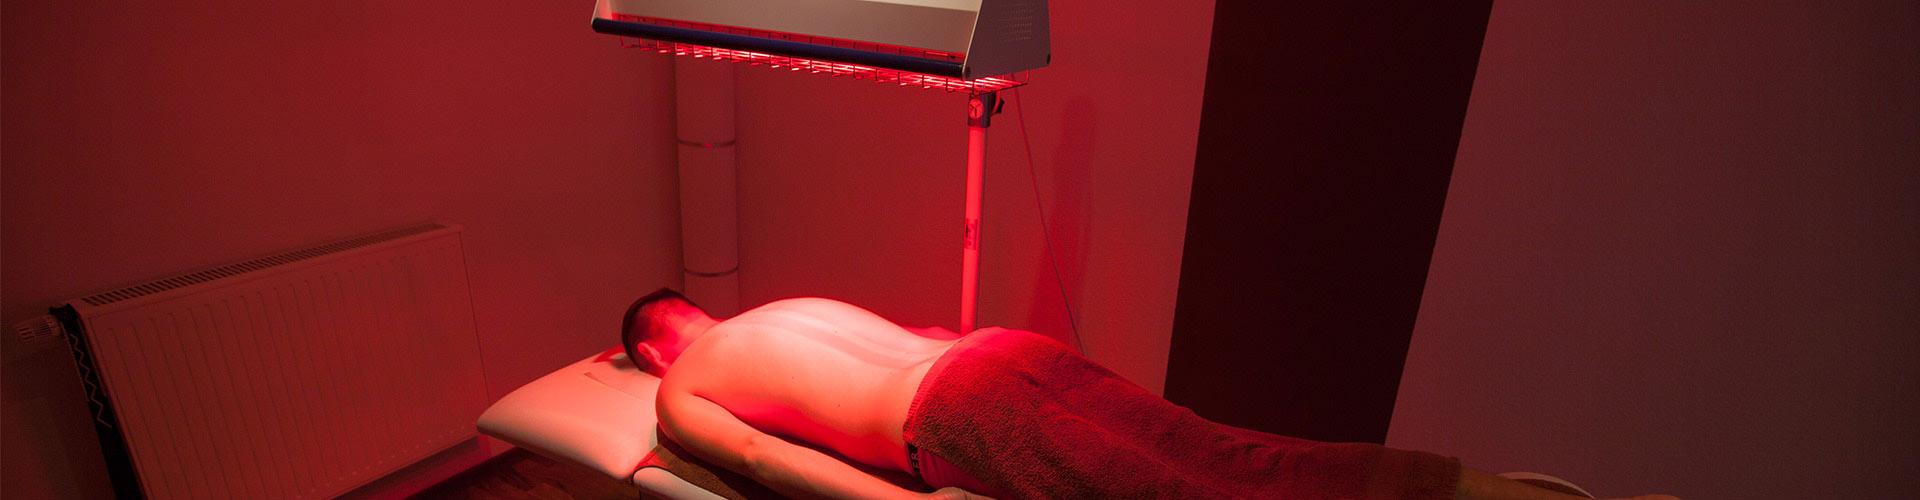 Wärmetherapie in Schwabach